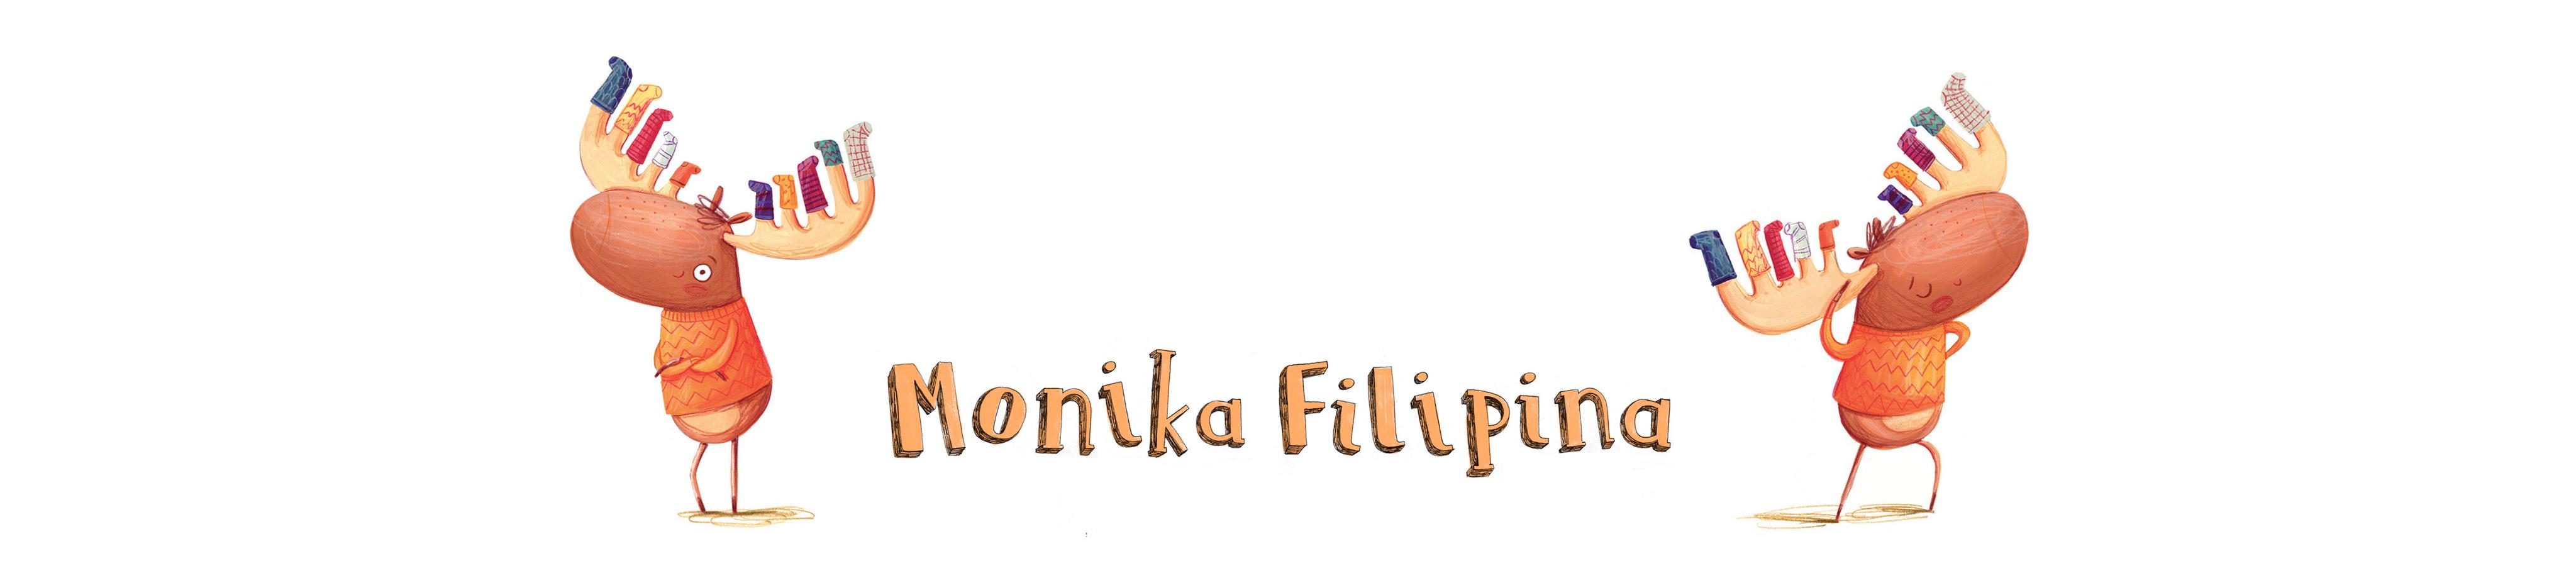 Monika Filipina